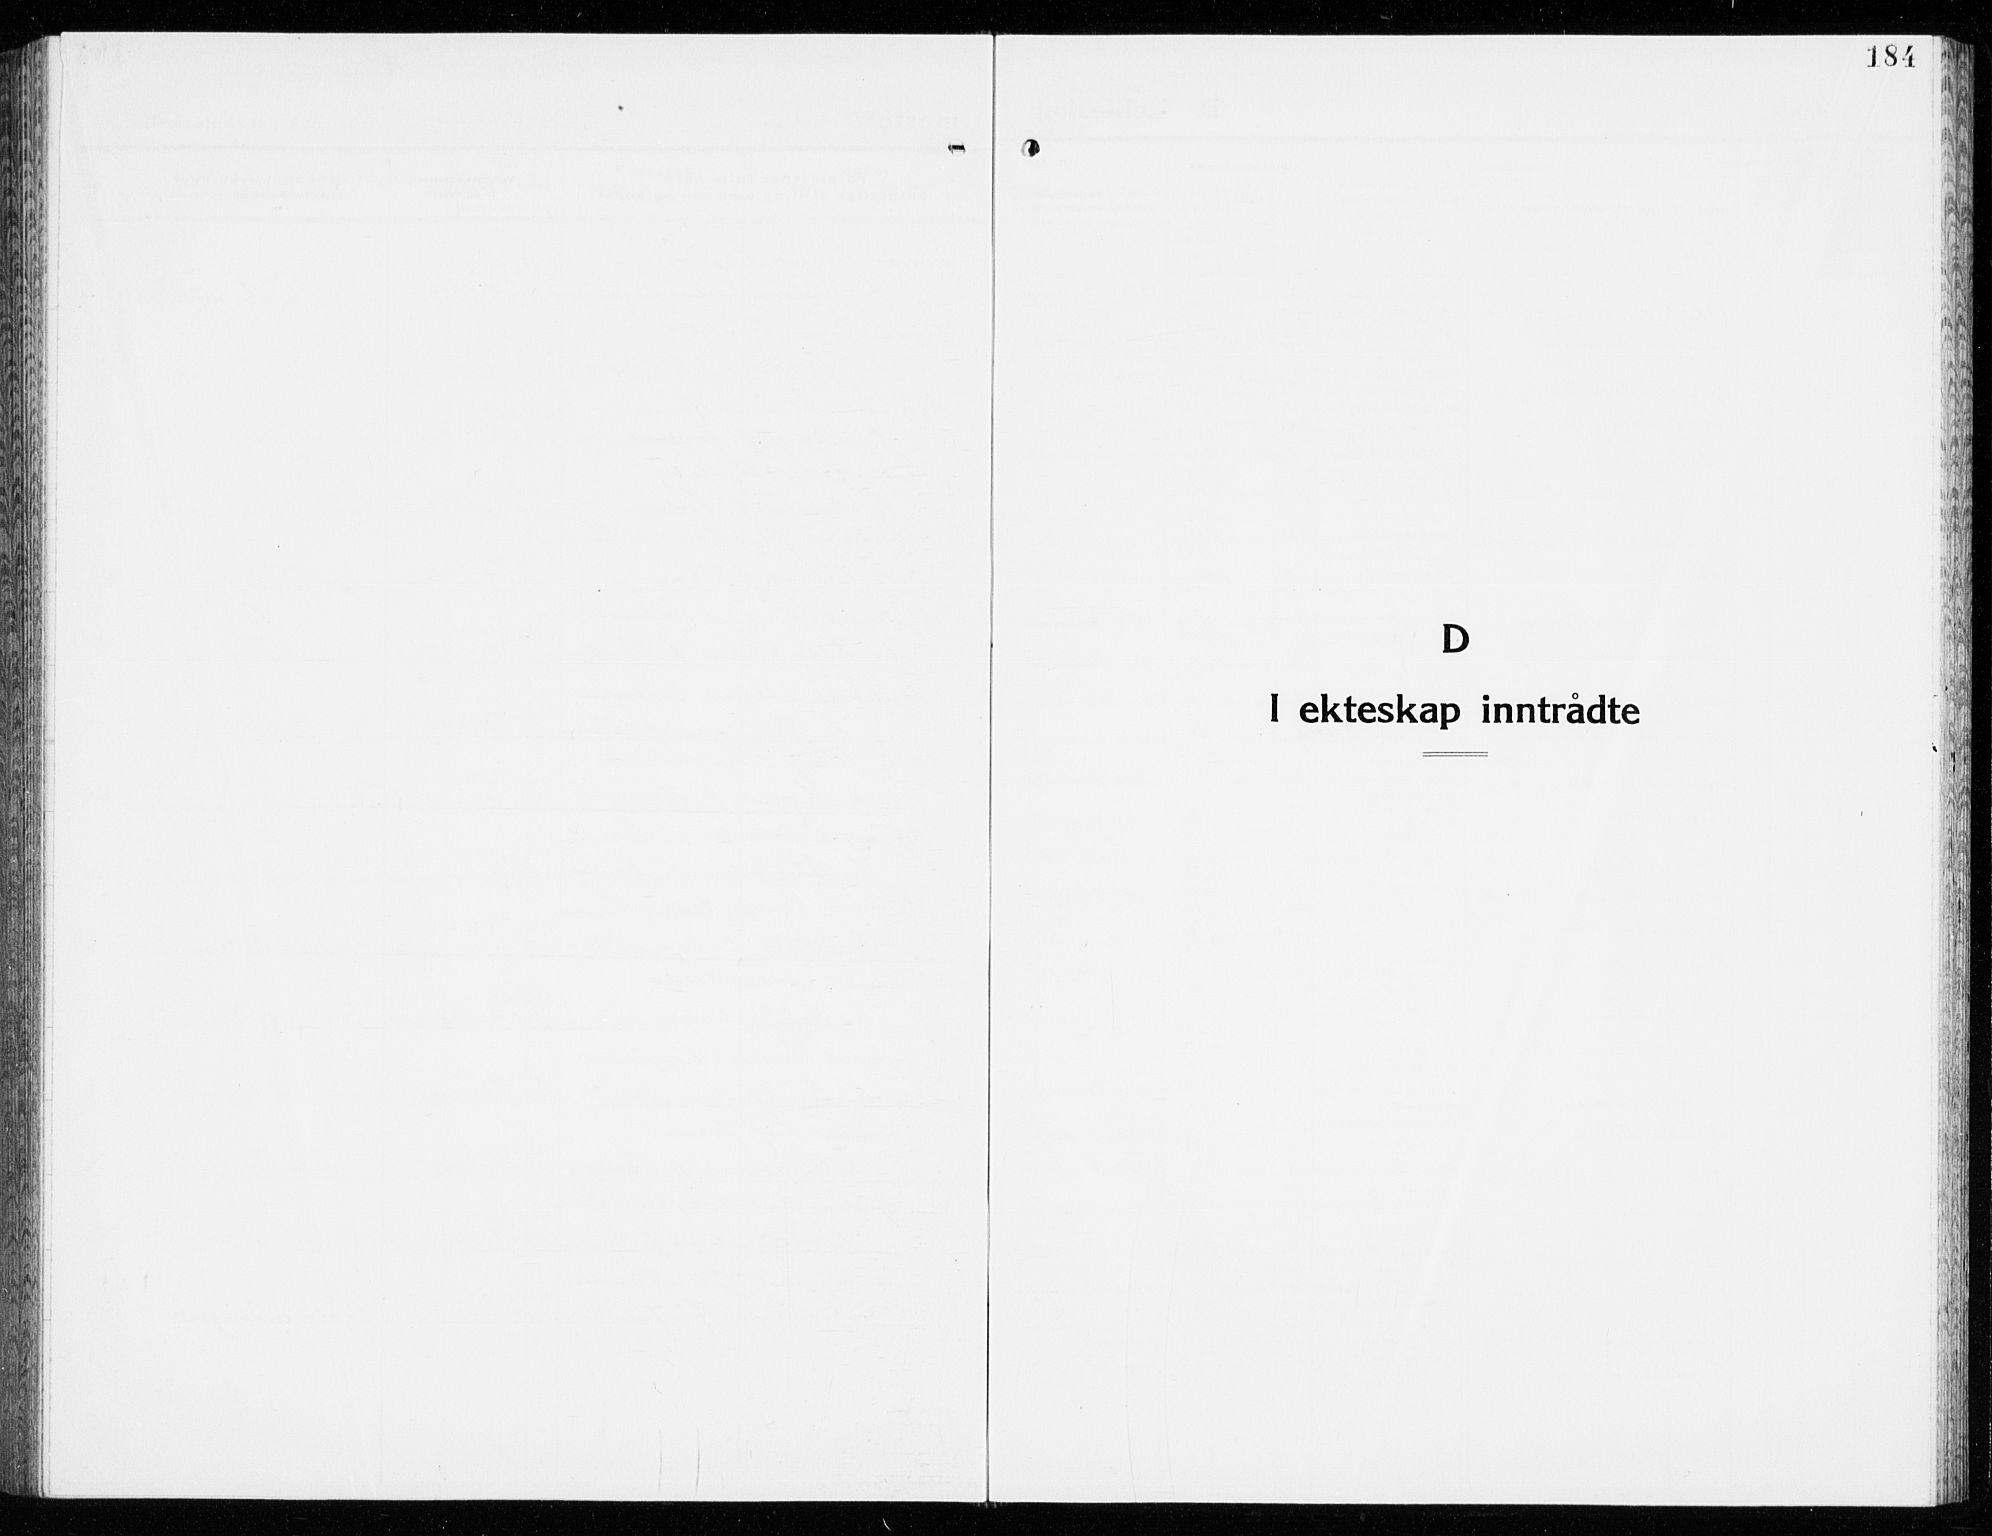 SAKO, Eidanger kirkebøker, G/Ga/L0005: Parish register (copy) no. 5, 1928-1942, p. 184